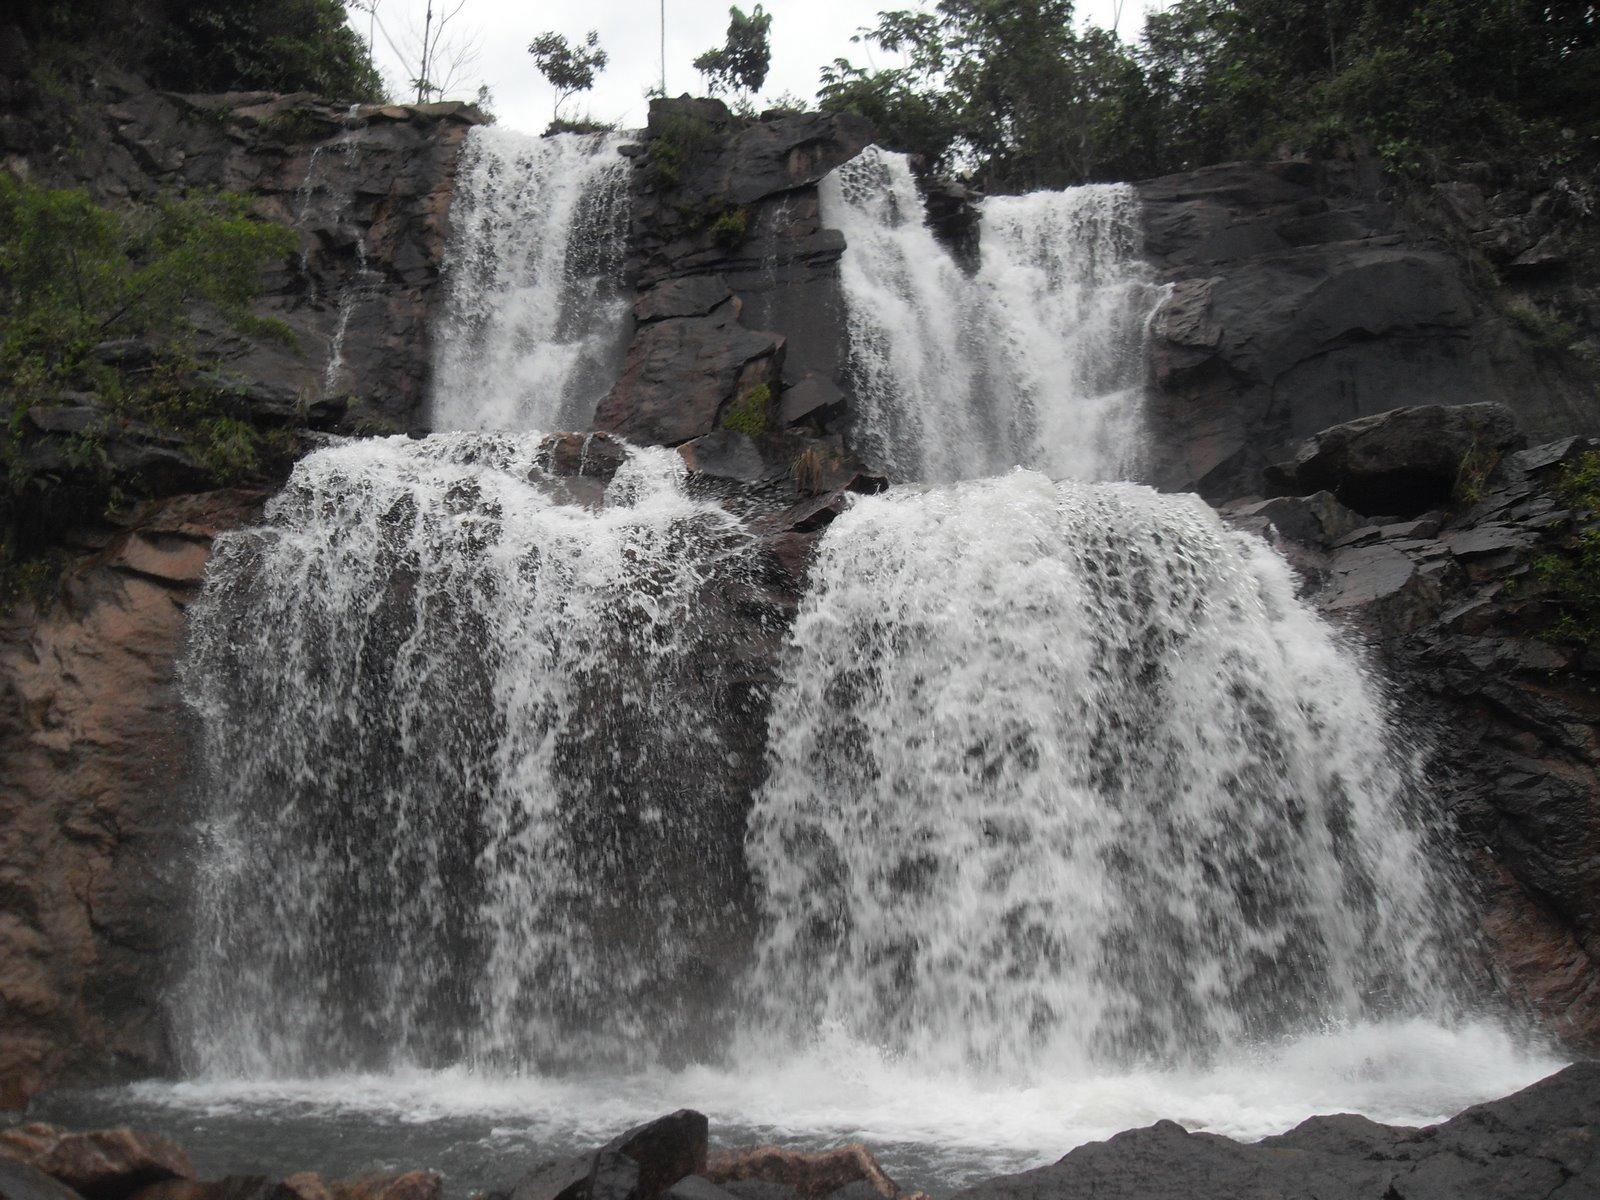 Cachoeira da Pedra ou Granito, Caroebe -Roraima, fonte: blogdodiouro